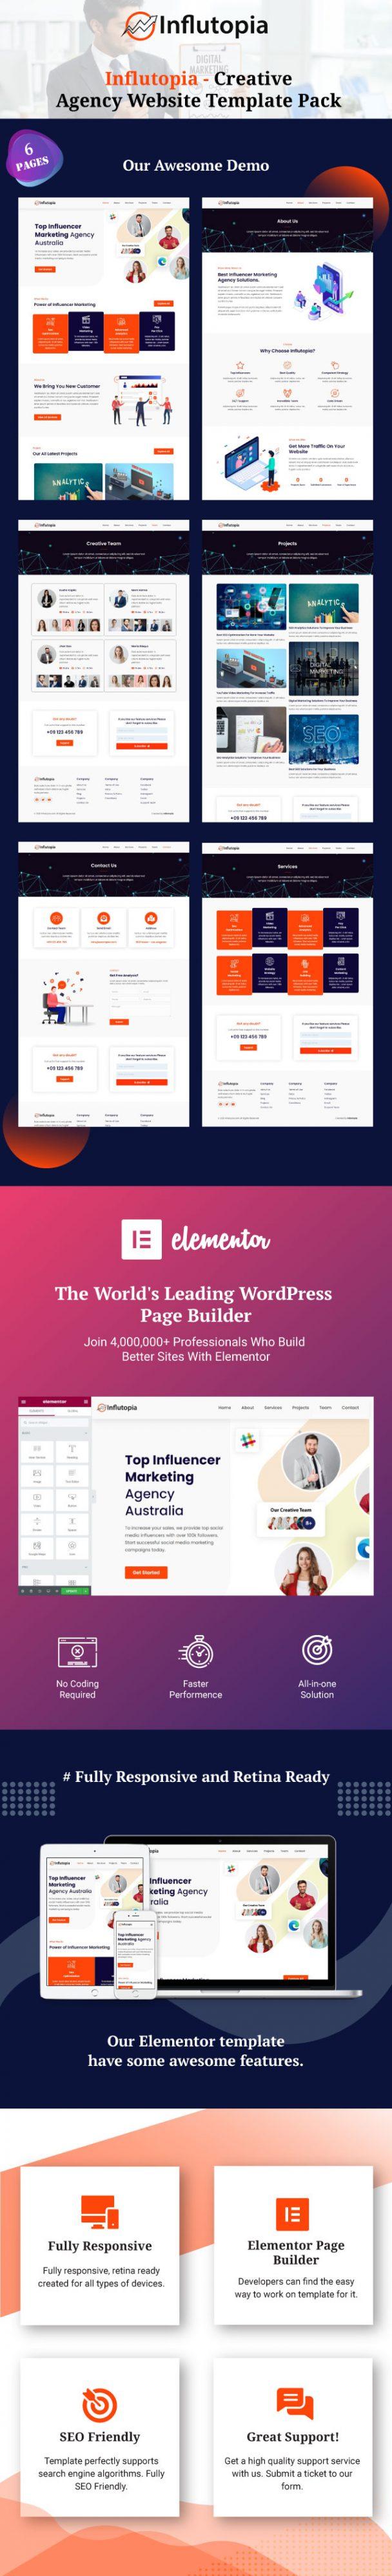 influtopia-creative-agency-website-template-pack